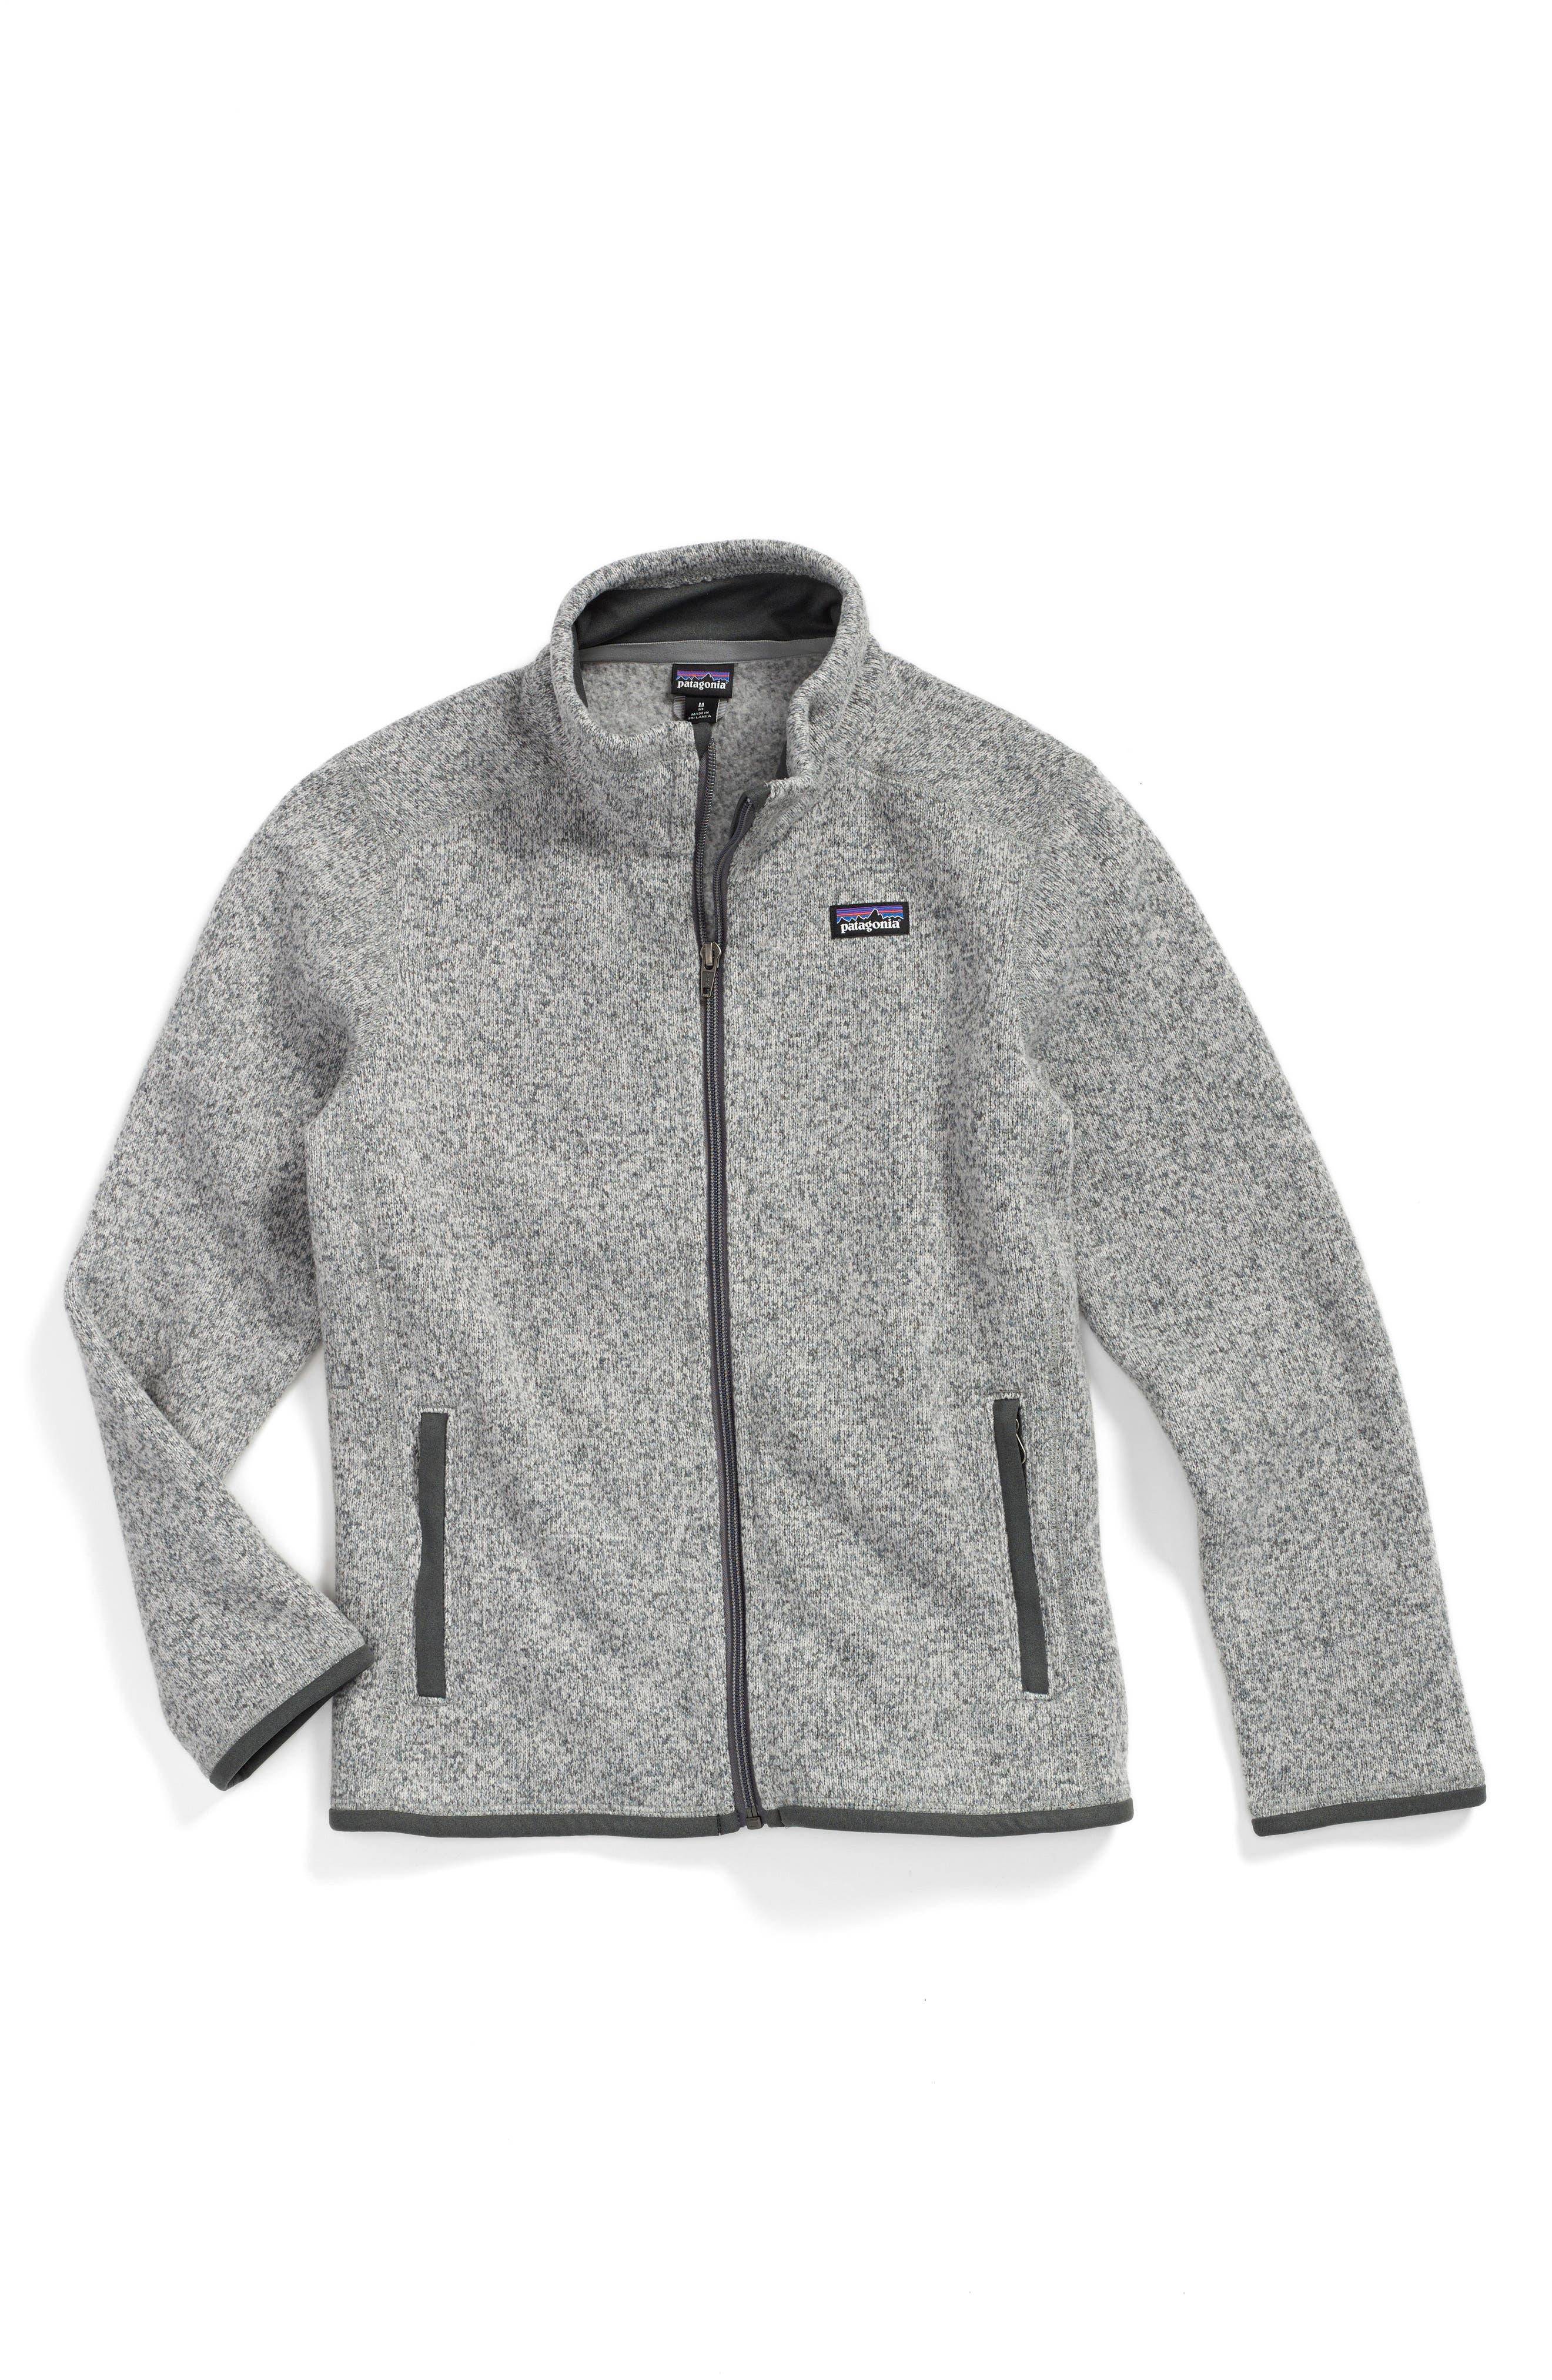 Better Sweater Jacket,                             Alternate thumbnail 2, color,                             STONEWASH GREY